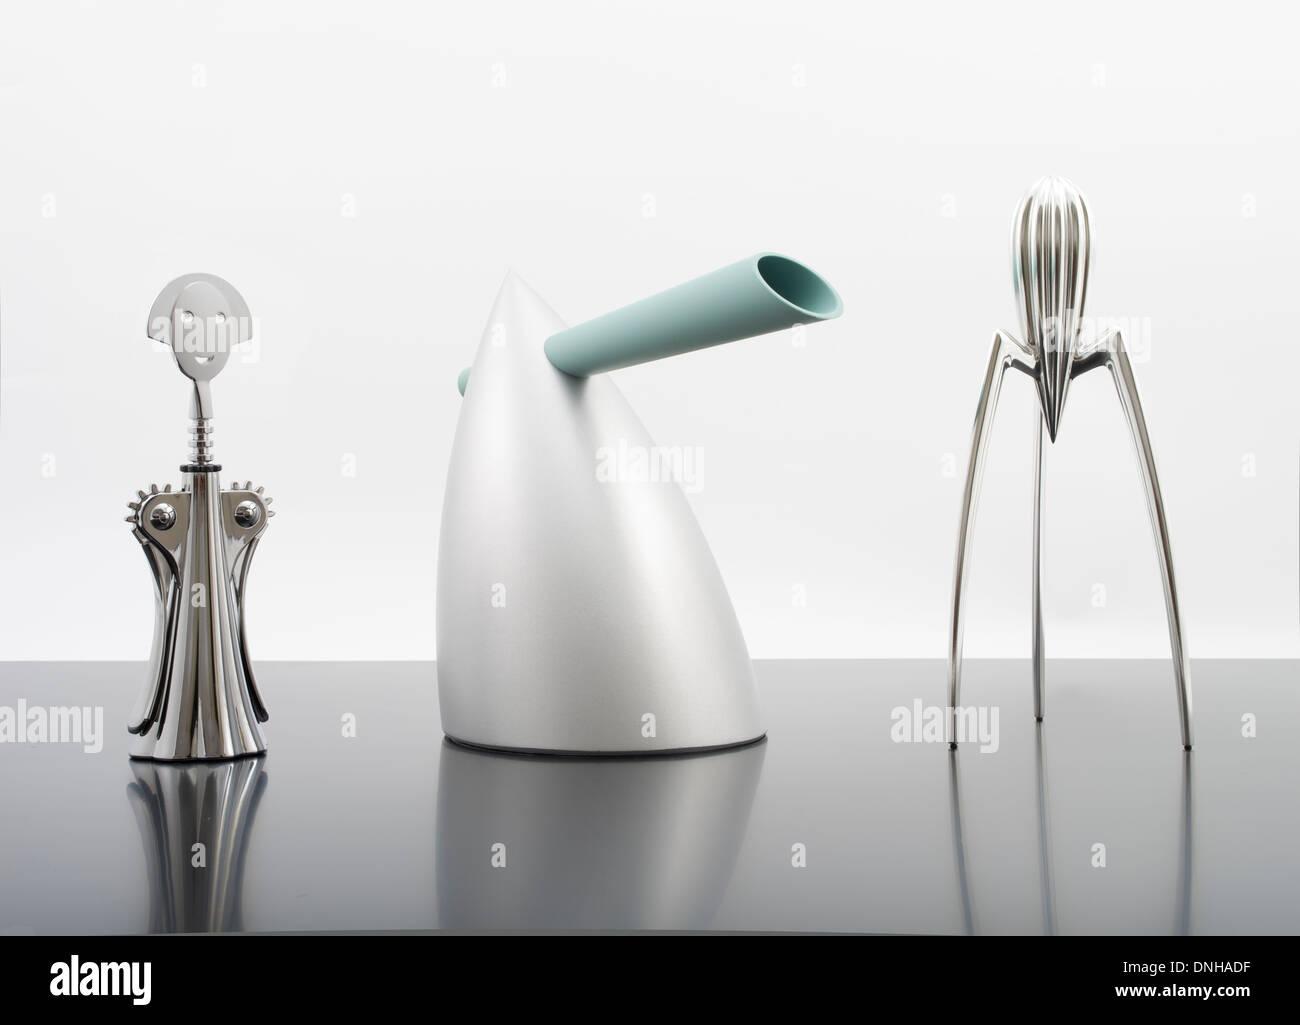 anna g corkscrew hot bertaa water kettle alessi juicy salif stock photo royalty free image. Black Bedroom Furniture Sets. Home Design Ideas